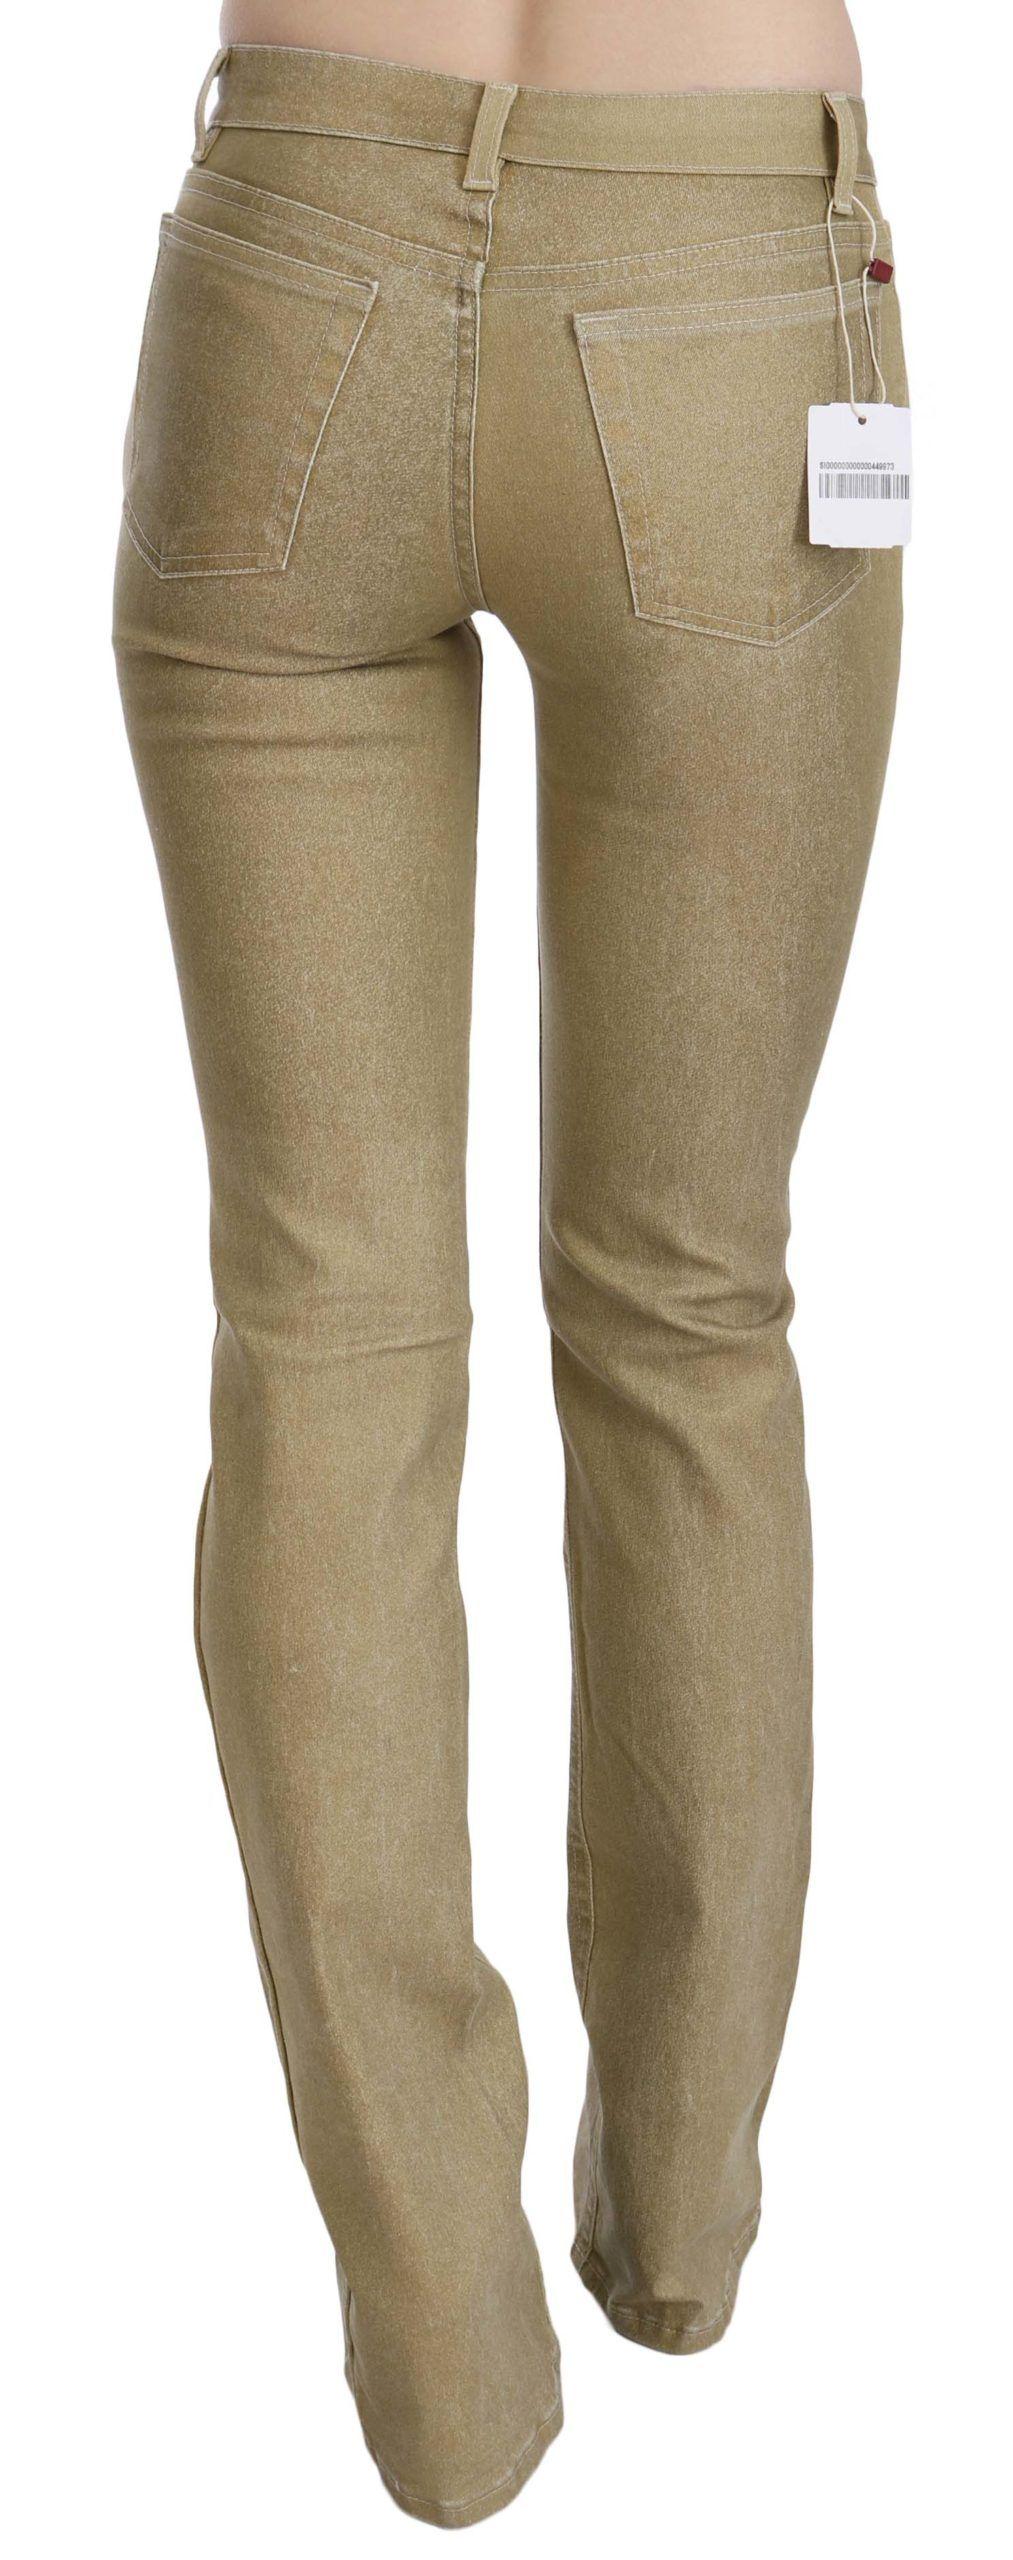 Cavalli Brown Mid Waist Skinny Denim Pants Jeans